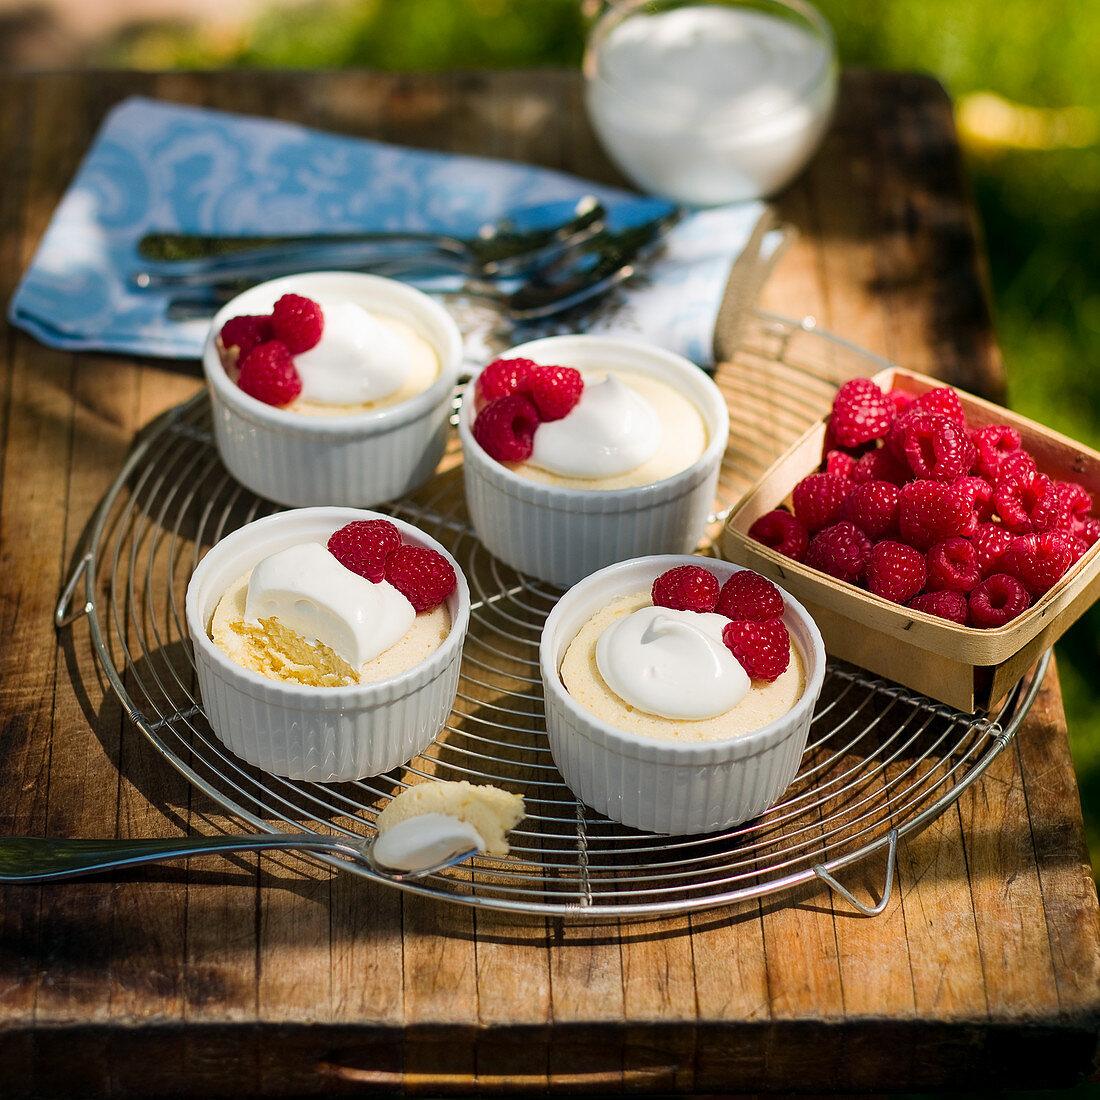 Lemon goat's cheese soufflés with raspberries